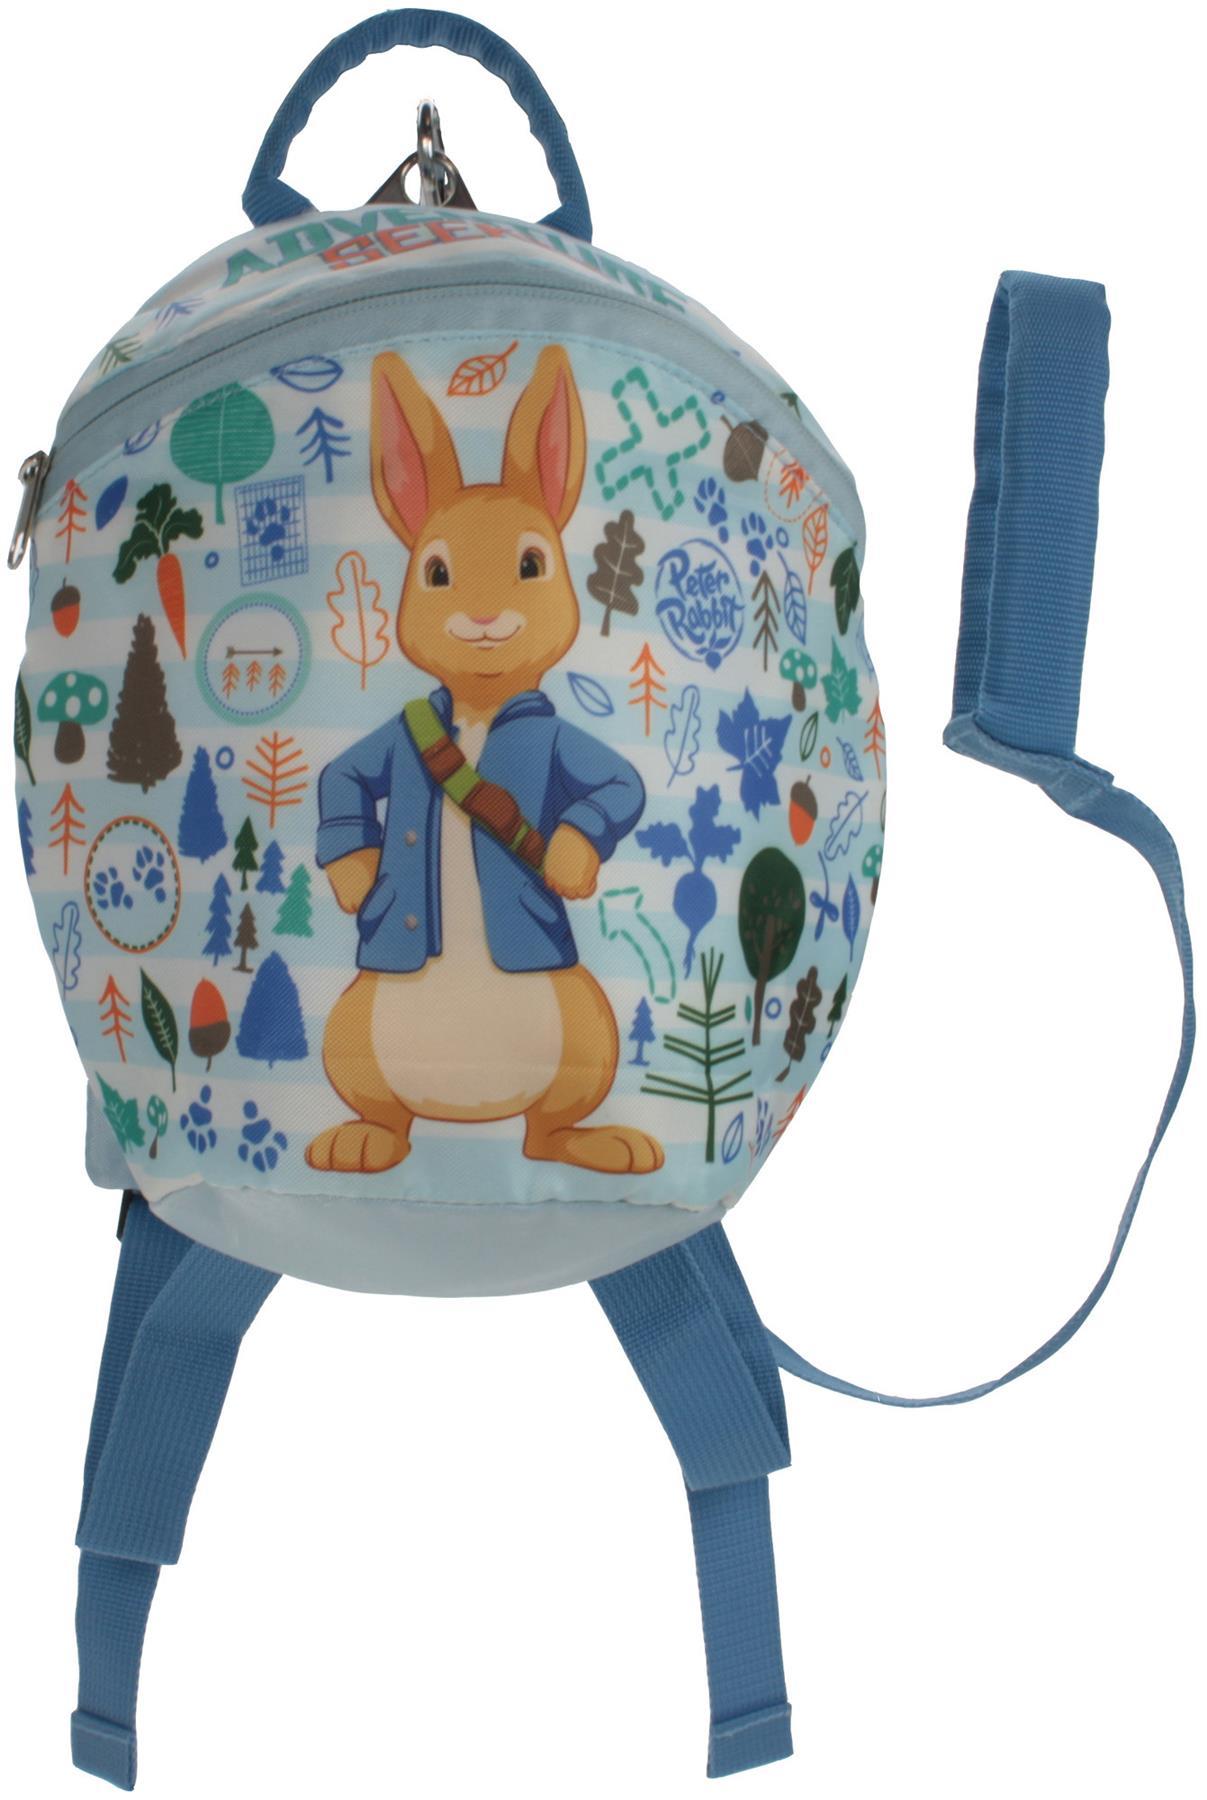 LIGHT BLUE Kids Bag BNIP Trade Mark Collections PETER RABBIT SATCHEL